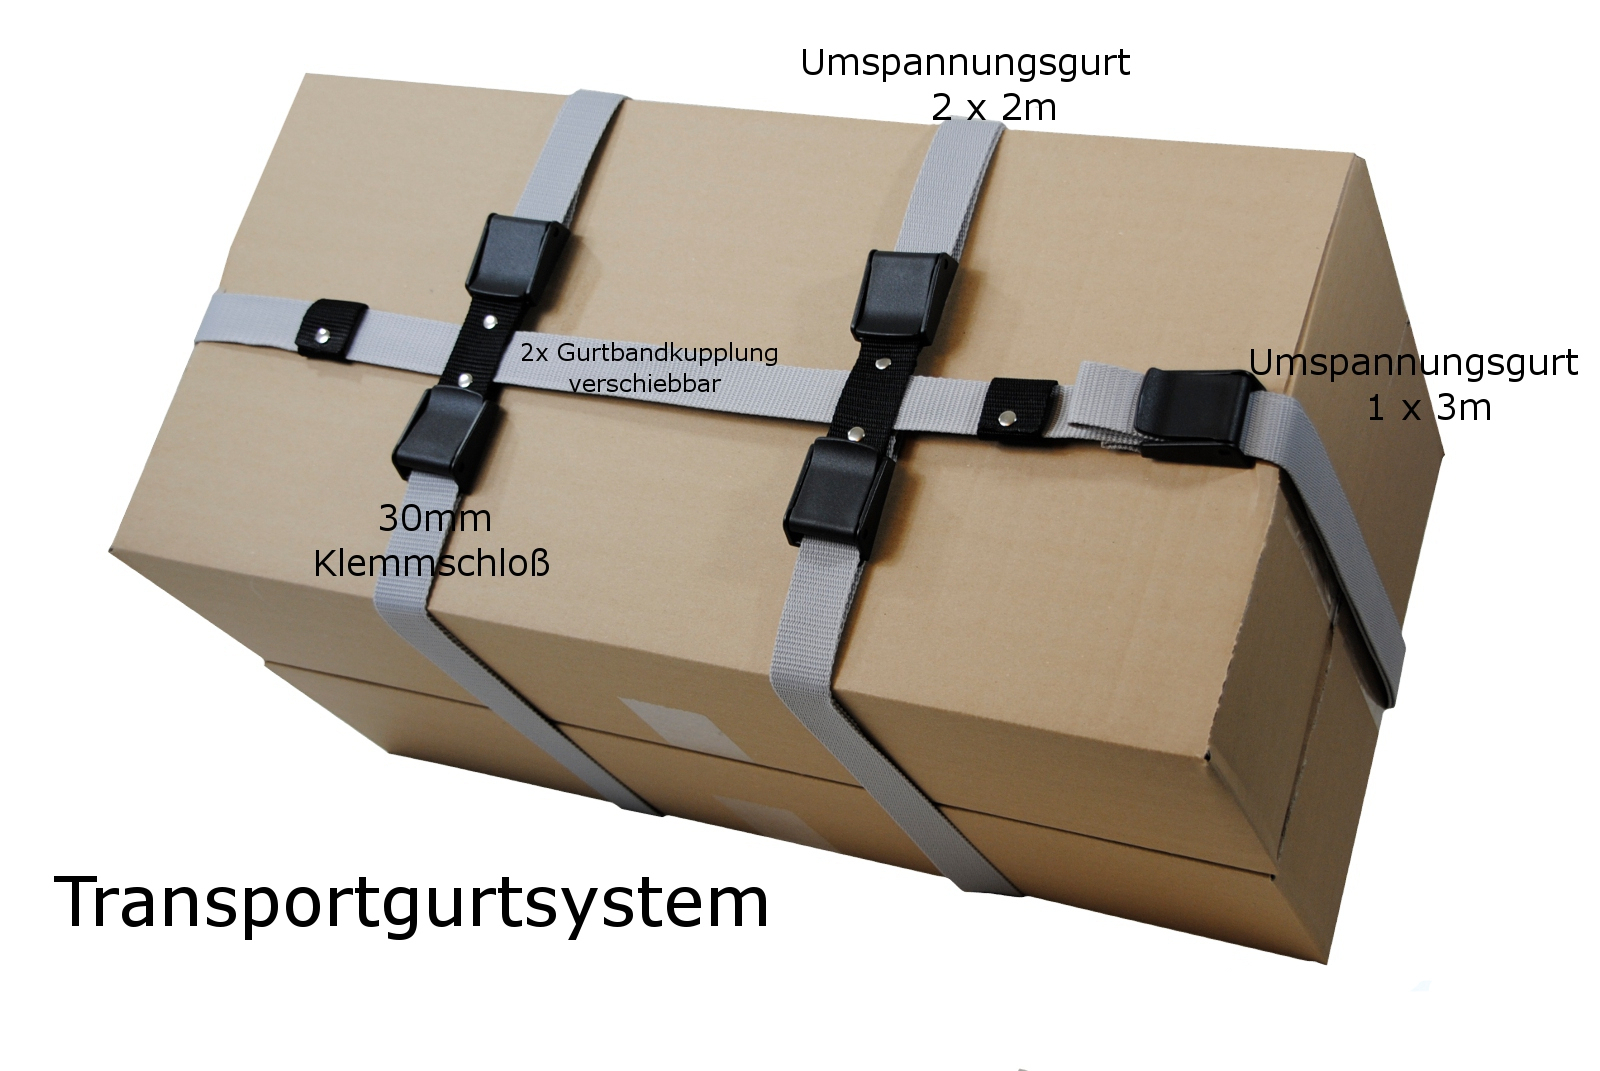 carrybelt maxi tragehilfe universal tragegestell tragegurt paketgurt bausatz ebay. Black Bedroom Furniture Sets. Home Design Ideas